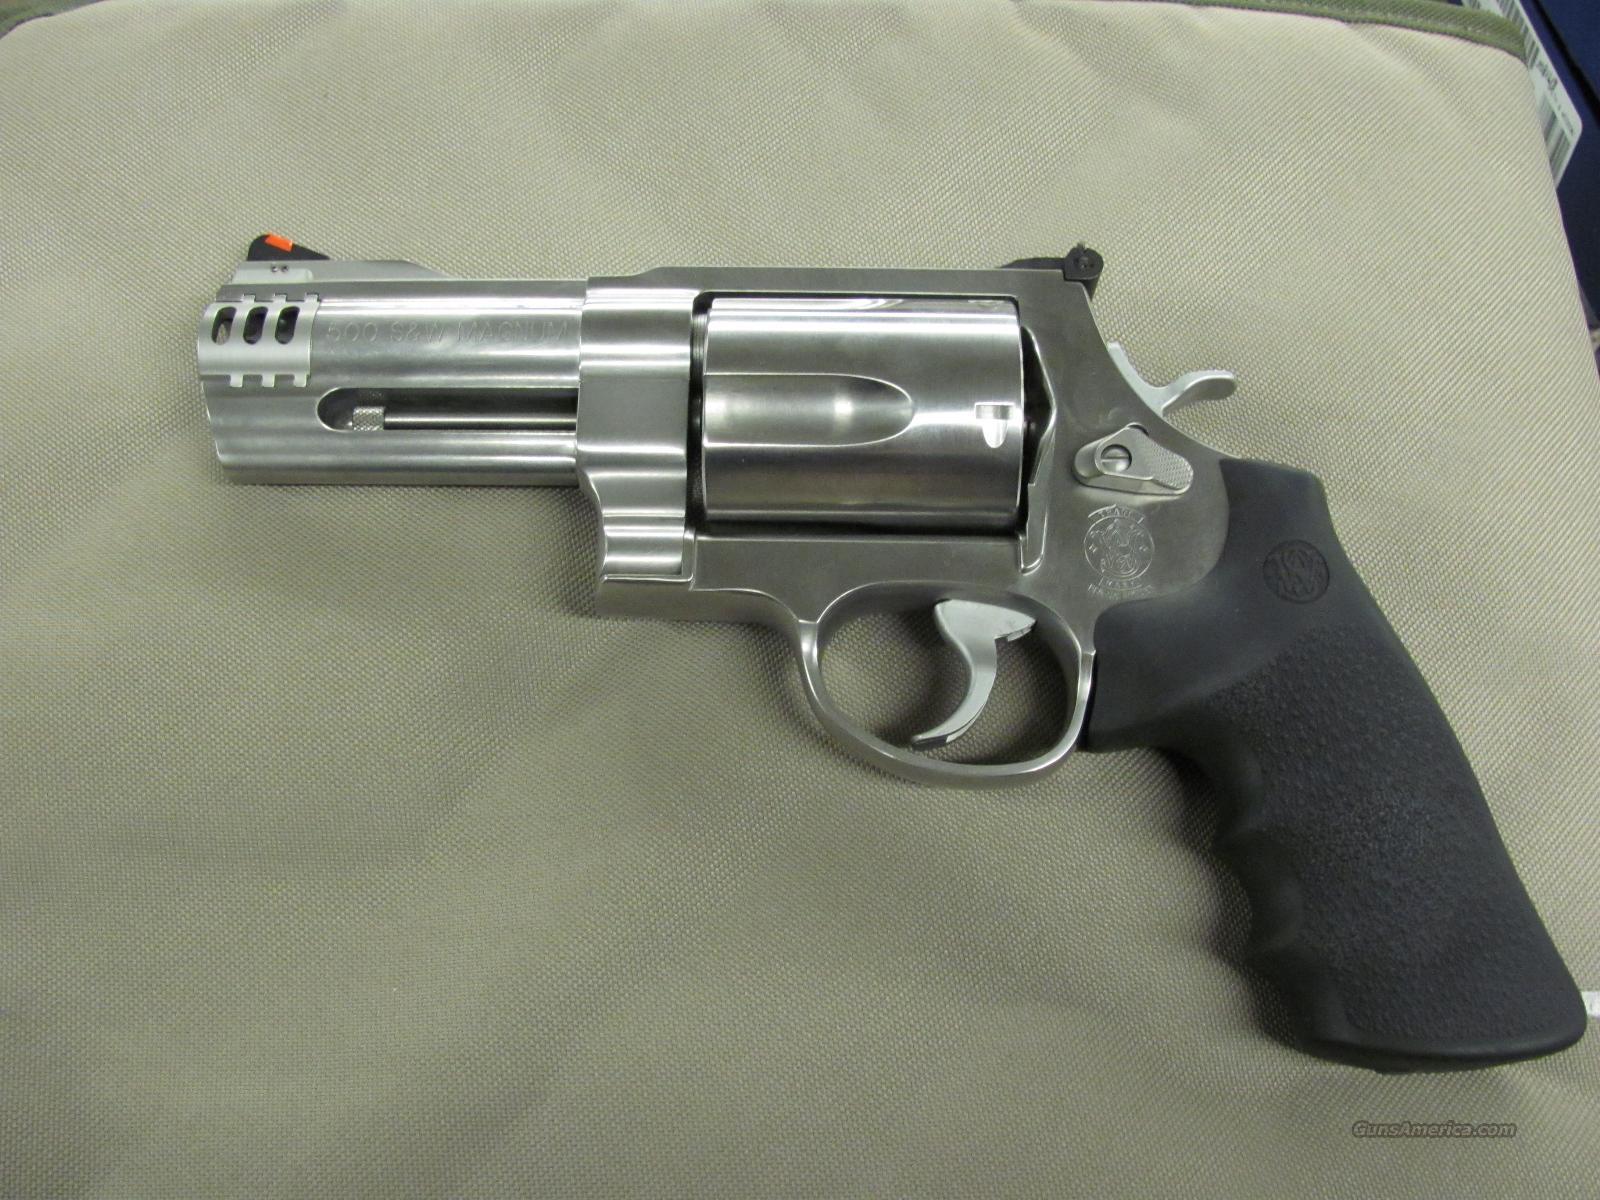 Smith & Wesson Model 500 4 inch  **NEW**  Guns > Pistols > Smith & Wesson Revolvers > Full Frame Revolver